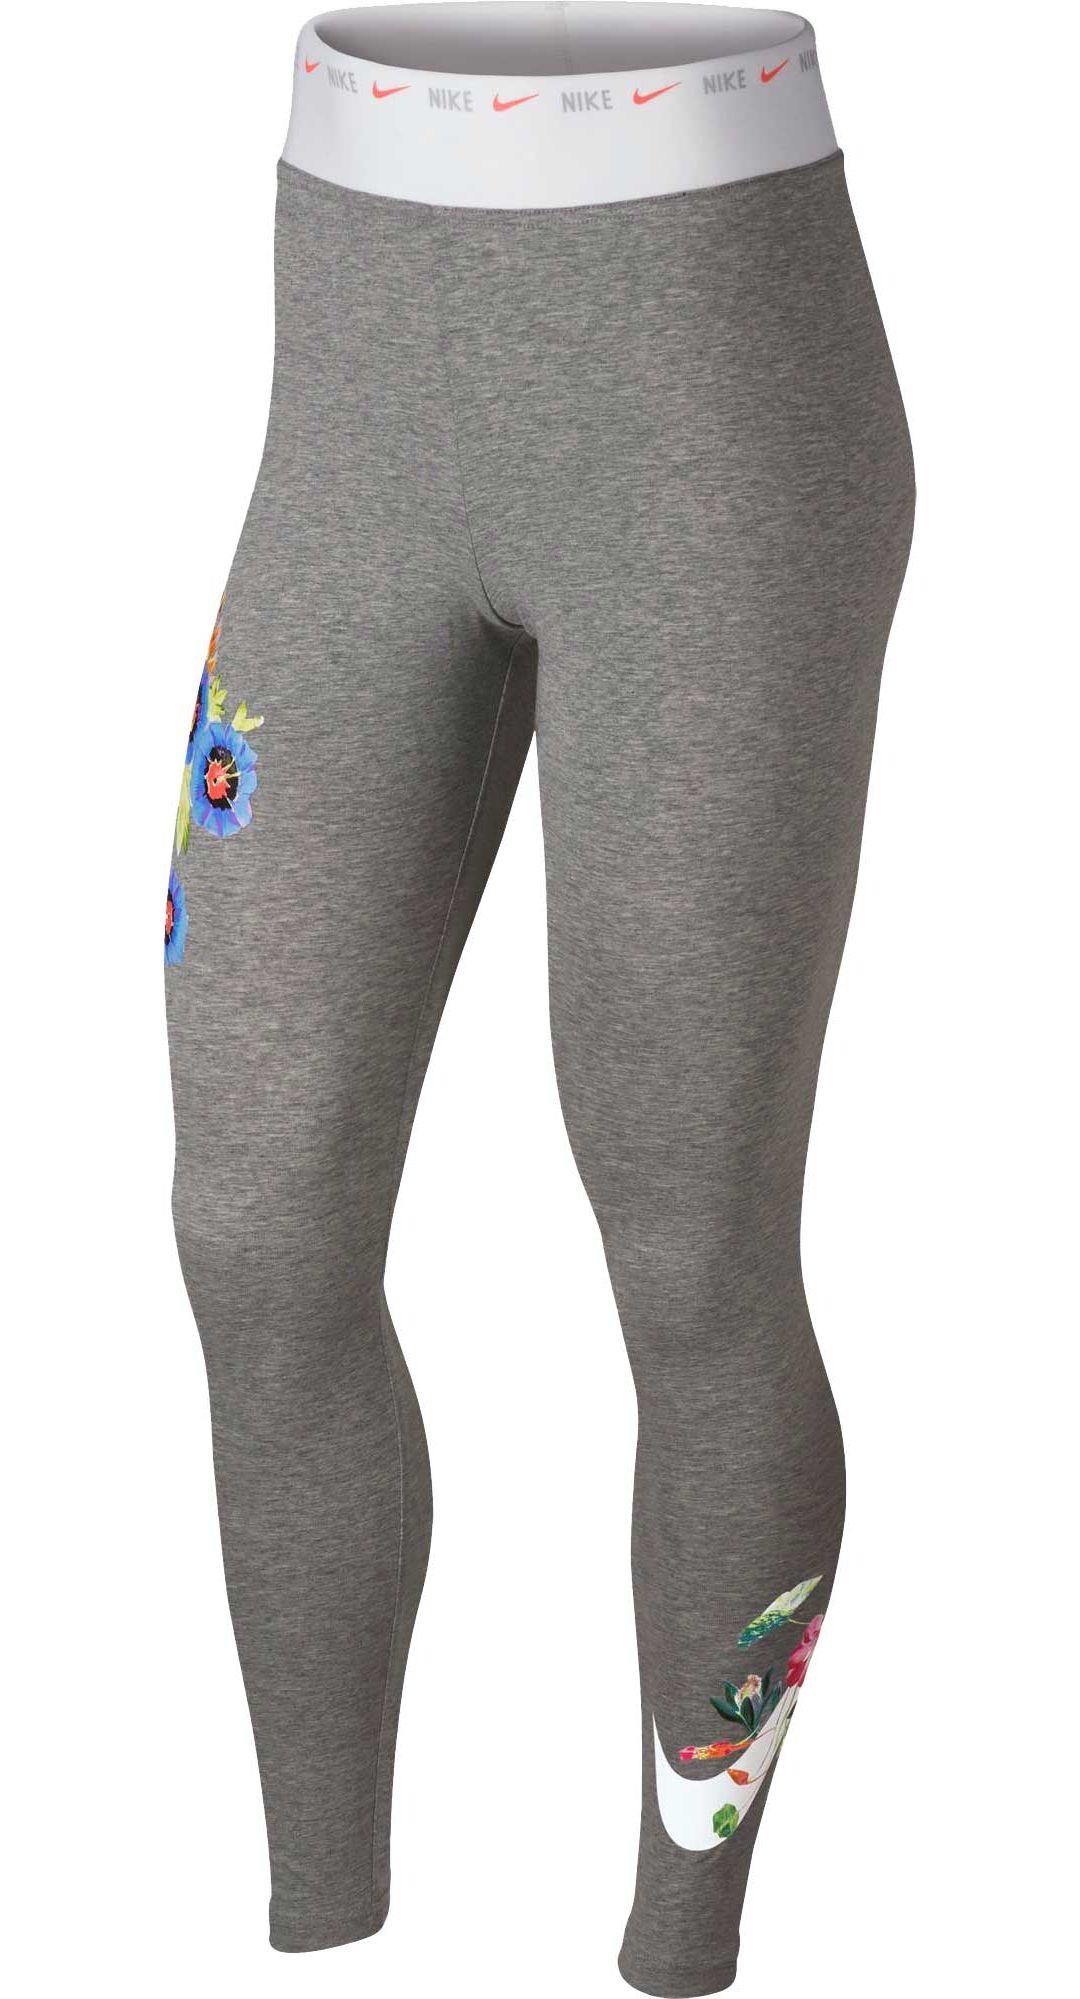 628e98b5b5 Nike Women's Sportswear Leg-A-See Femme Leggings | DICK'S Sporting Goods